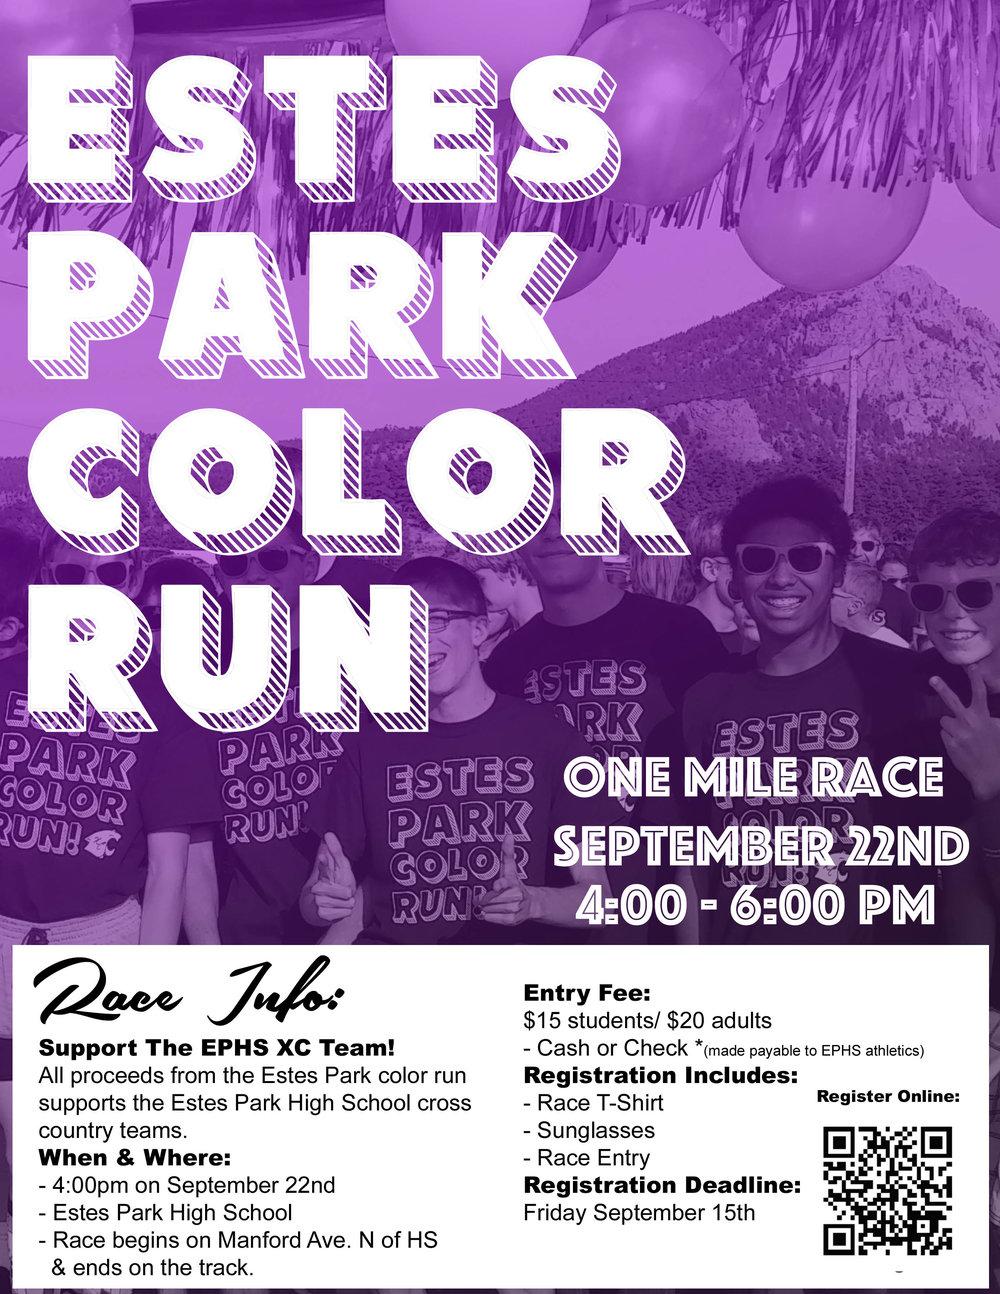 Color Run Poster 2017_edited-1.jpg